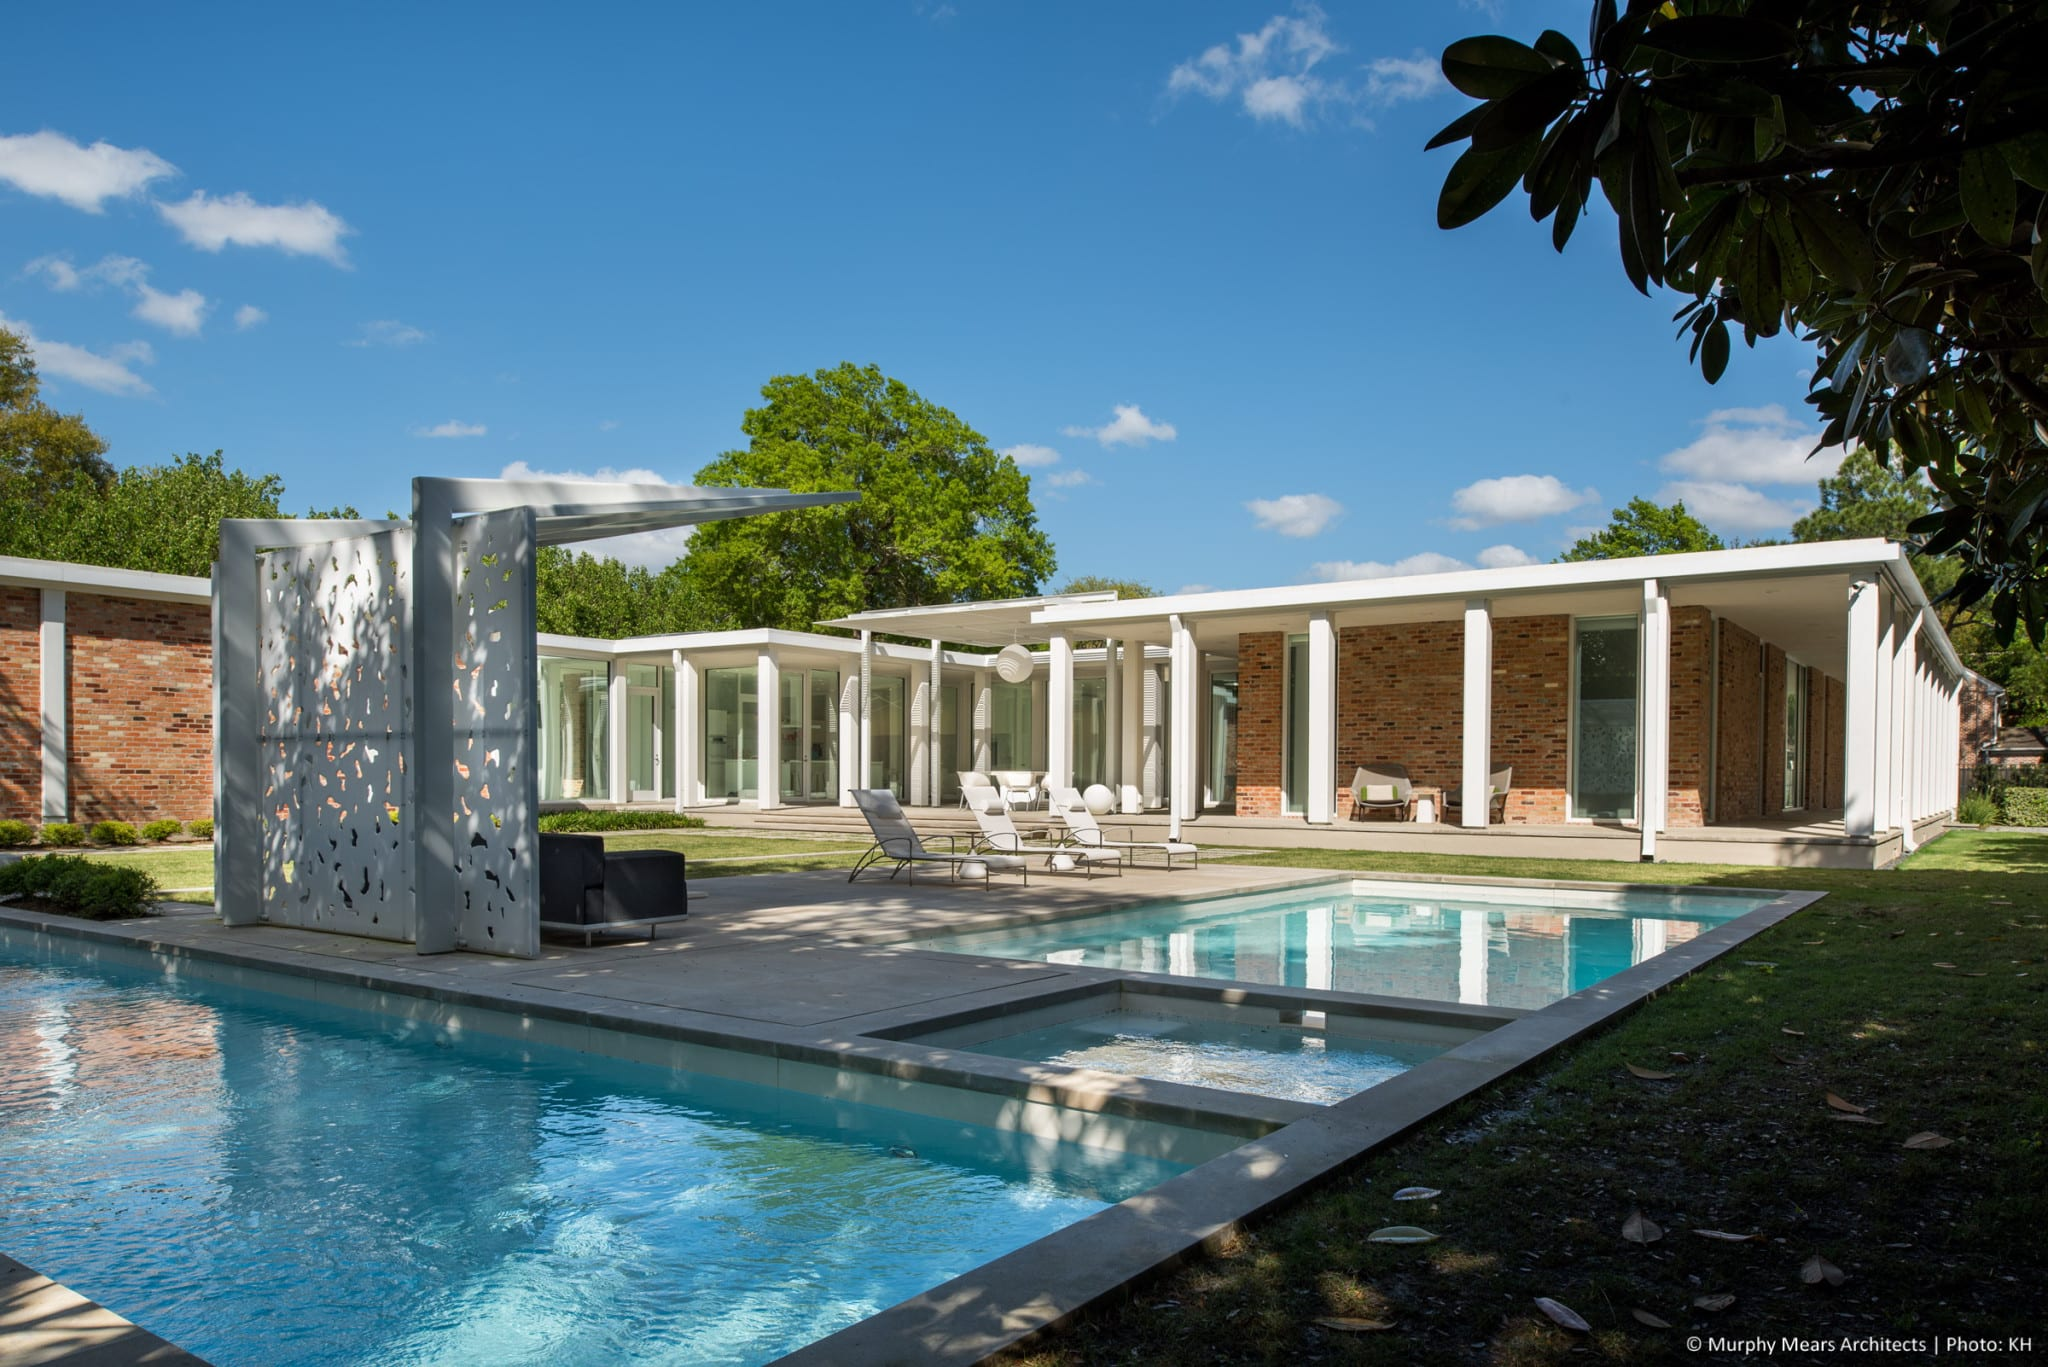 w-mid-century-modern-home-neuhaus-harwood-taylor-renovation-pool-porch-afternoon.jpg